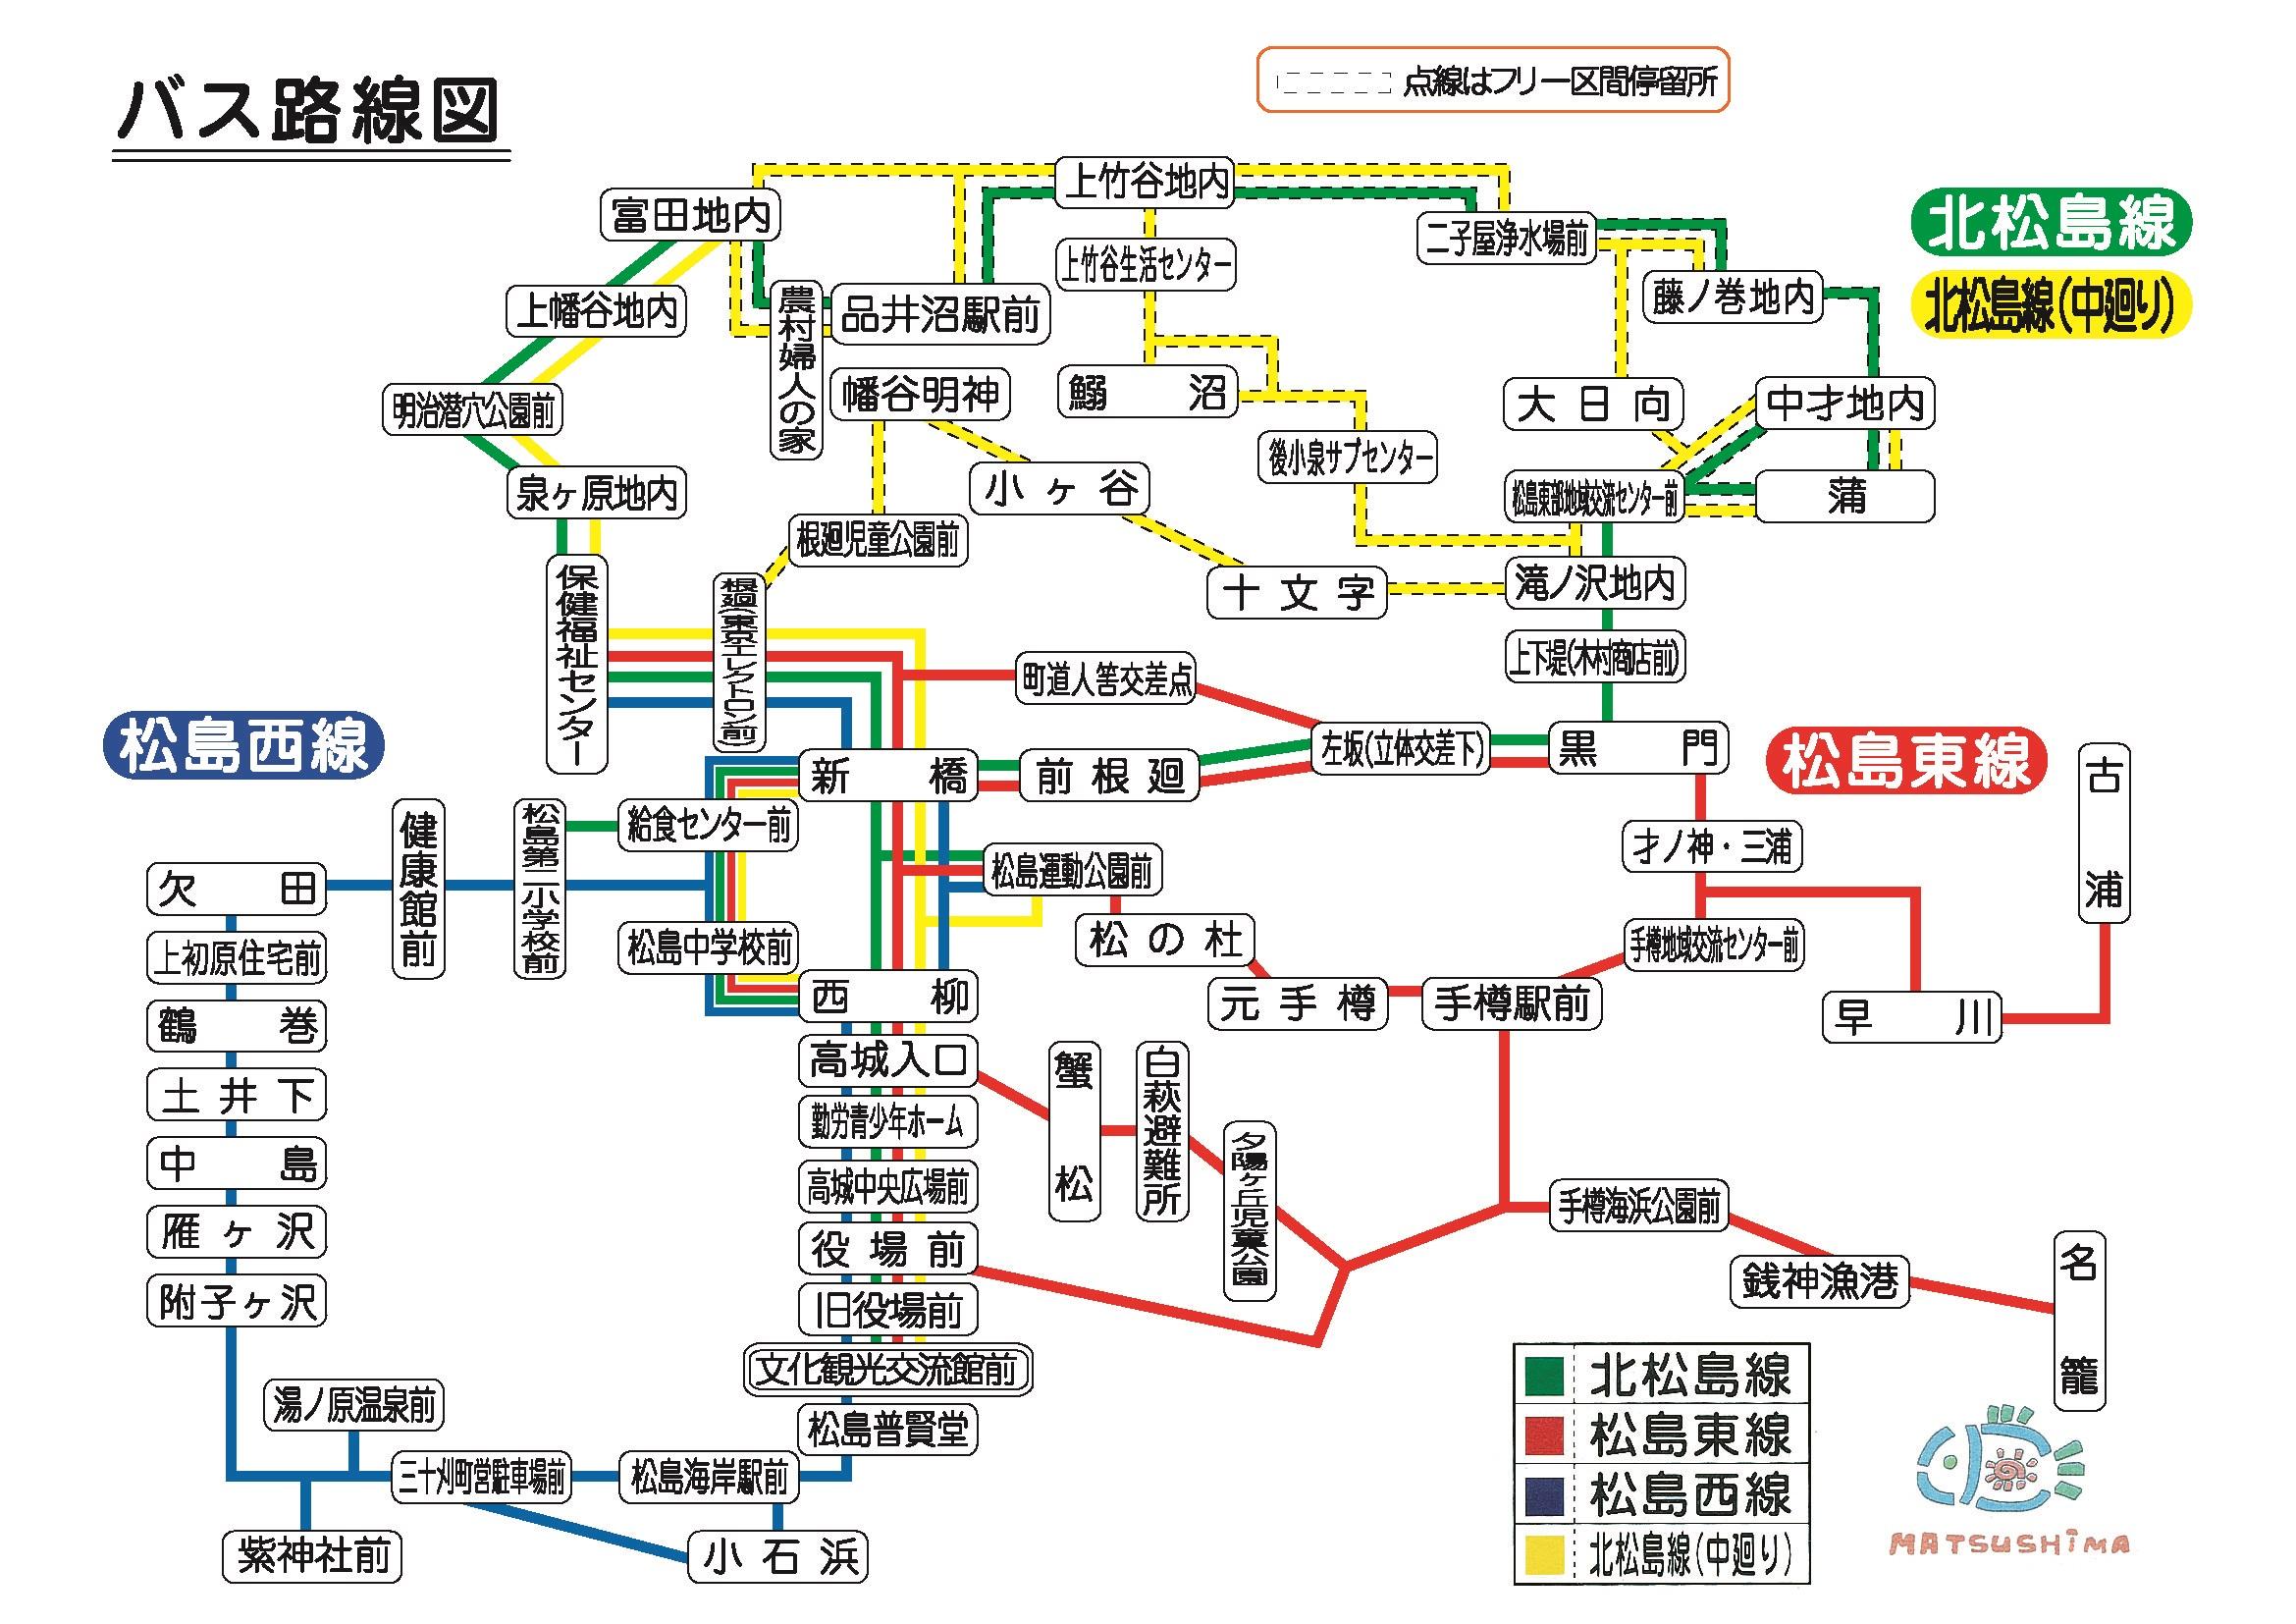 松島町町営バス路線図 - 宮城県...